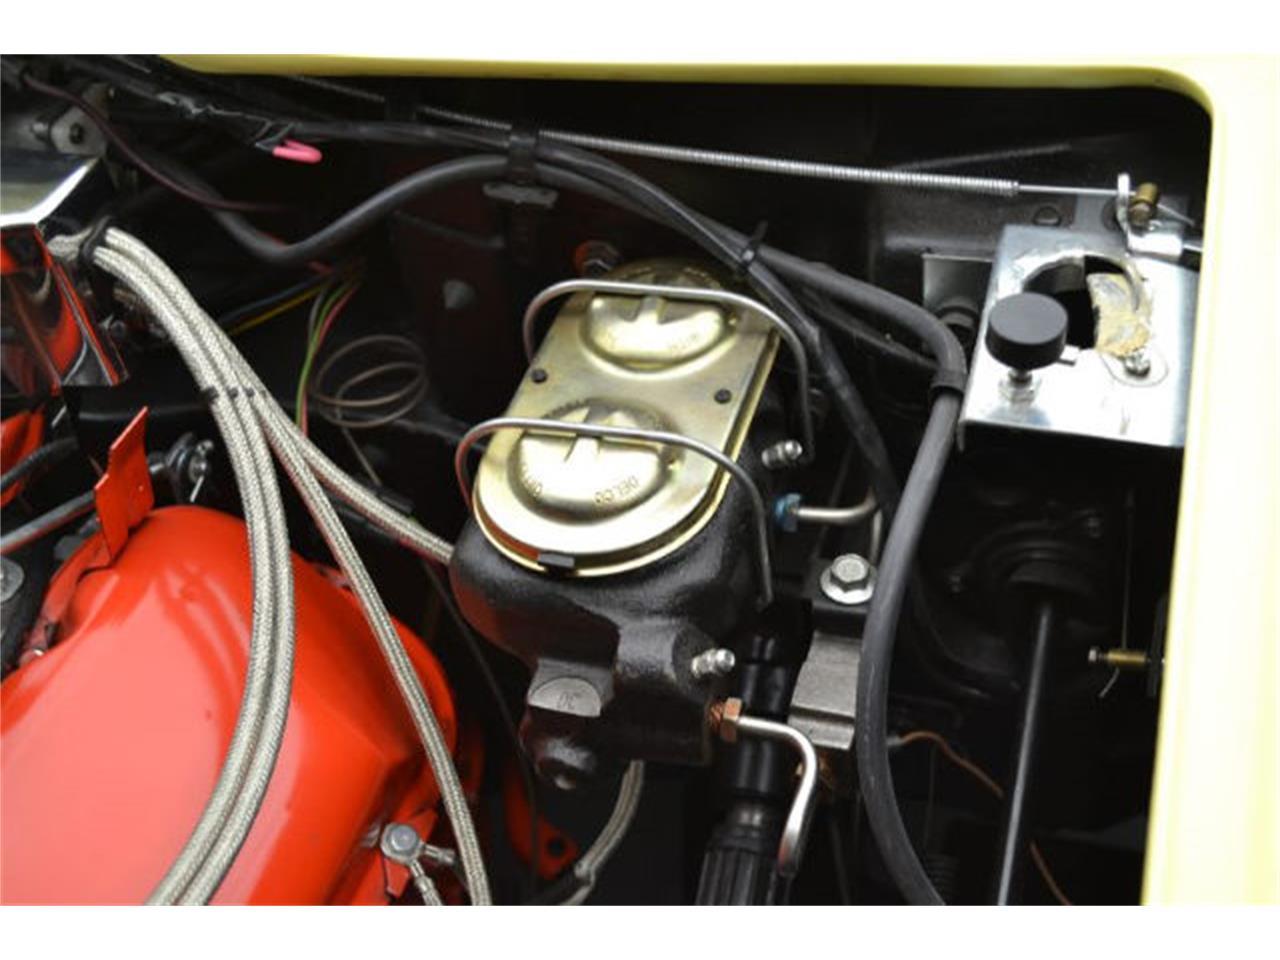 Large Picture of 1967 Chevrolet Corvette located in North Carolina - $139,995.00 - 8QFH